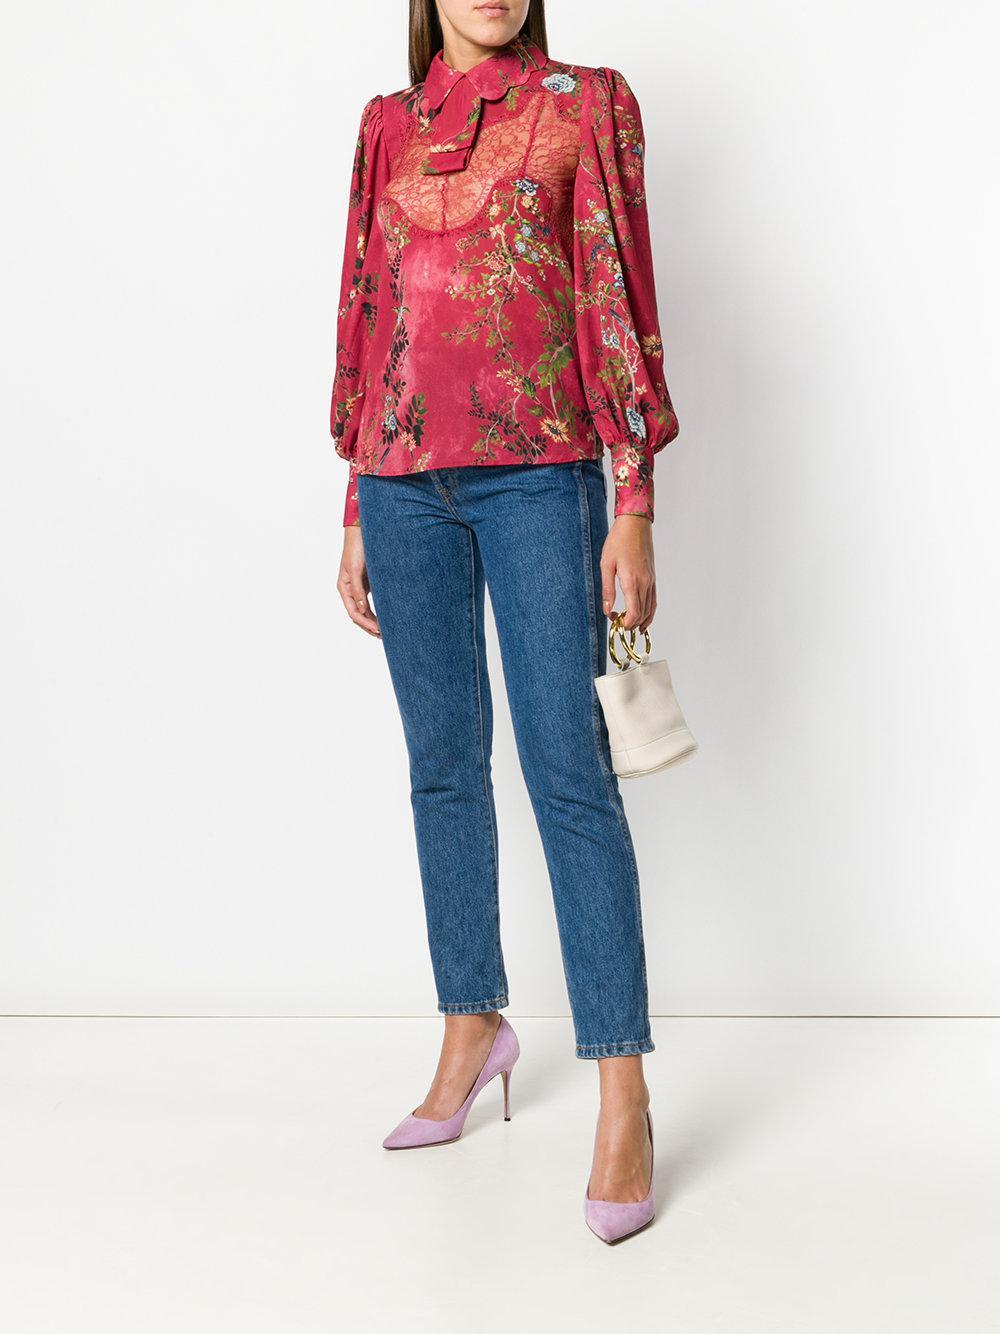 lace insert floral blouse - Red Elisabetta Franchi Real Sale Online Explore For Sale KGHS7F3zLE